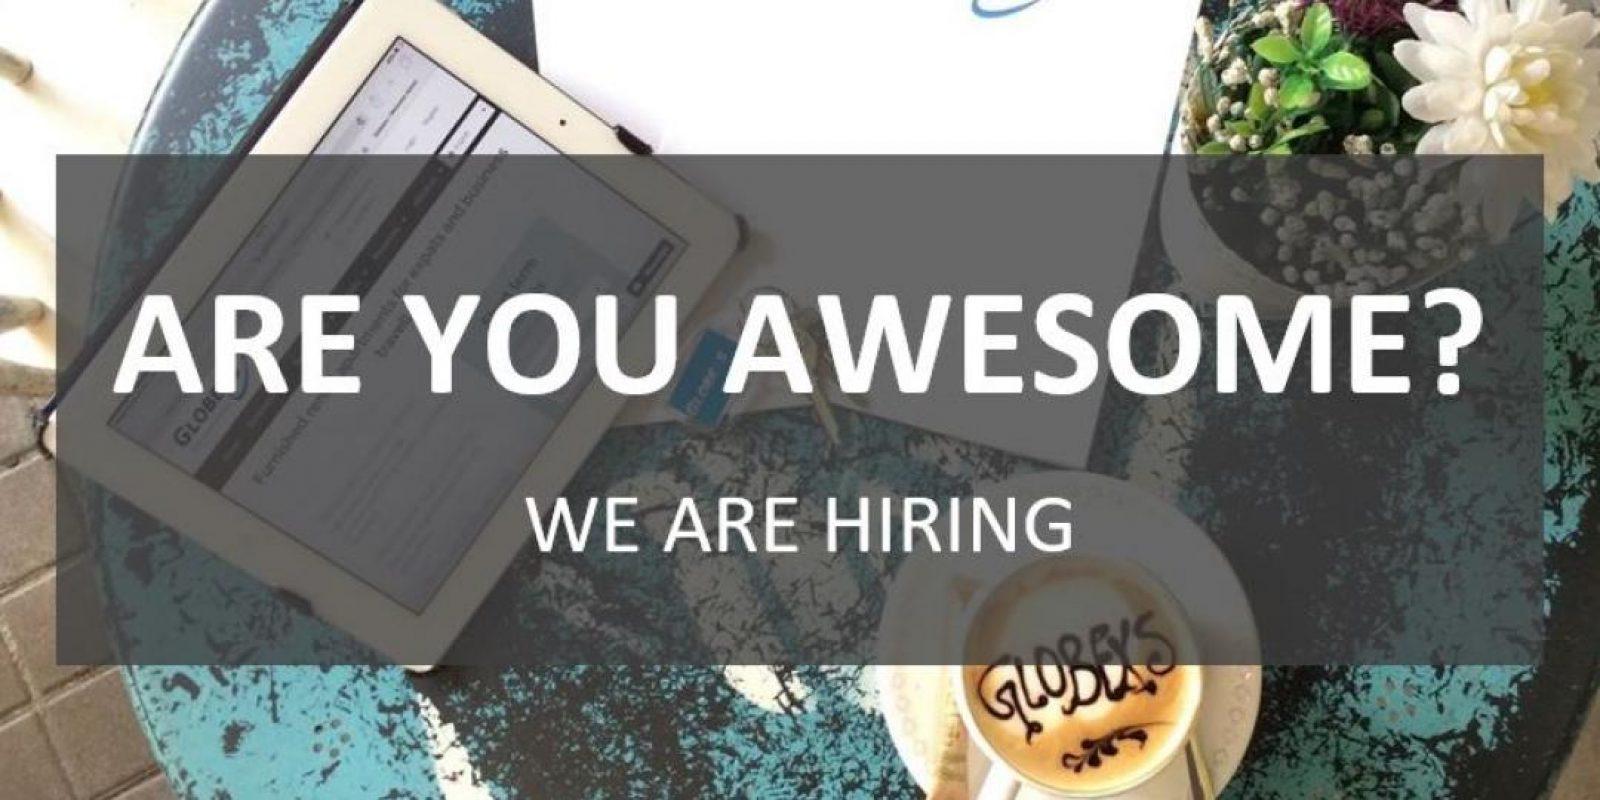 globexs_is_hiring